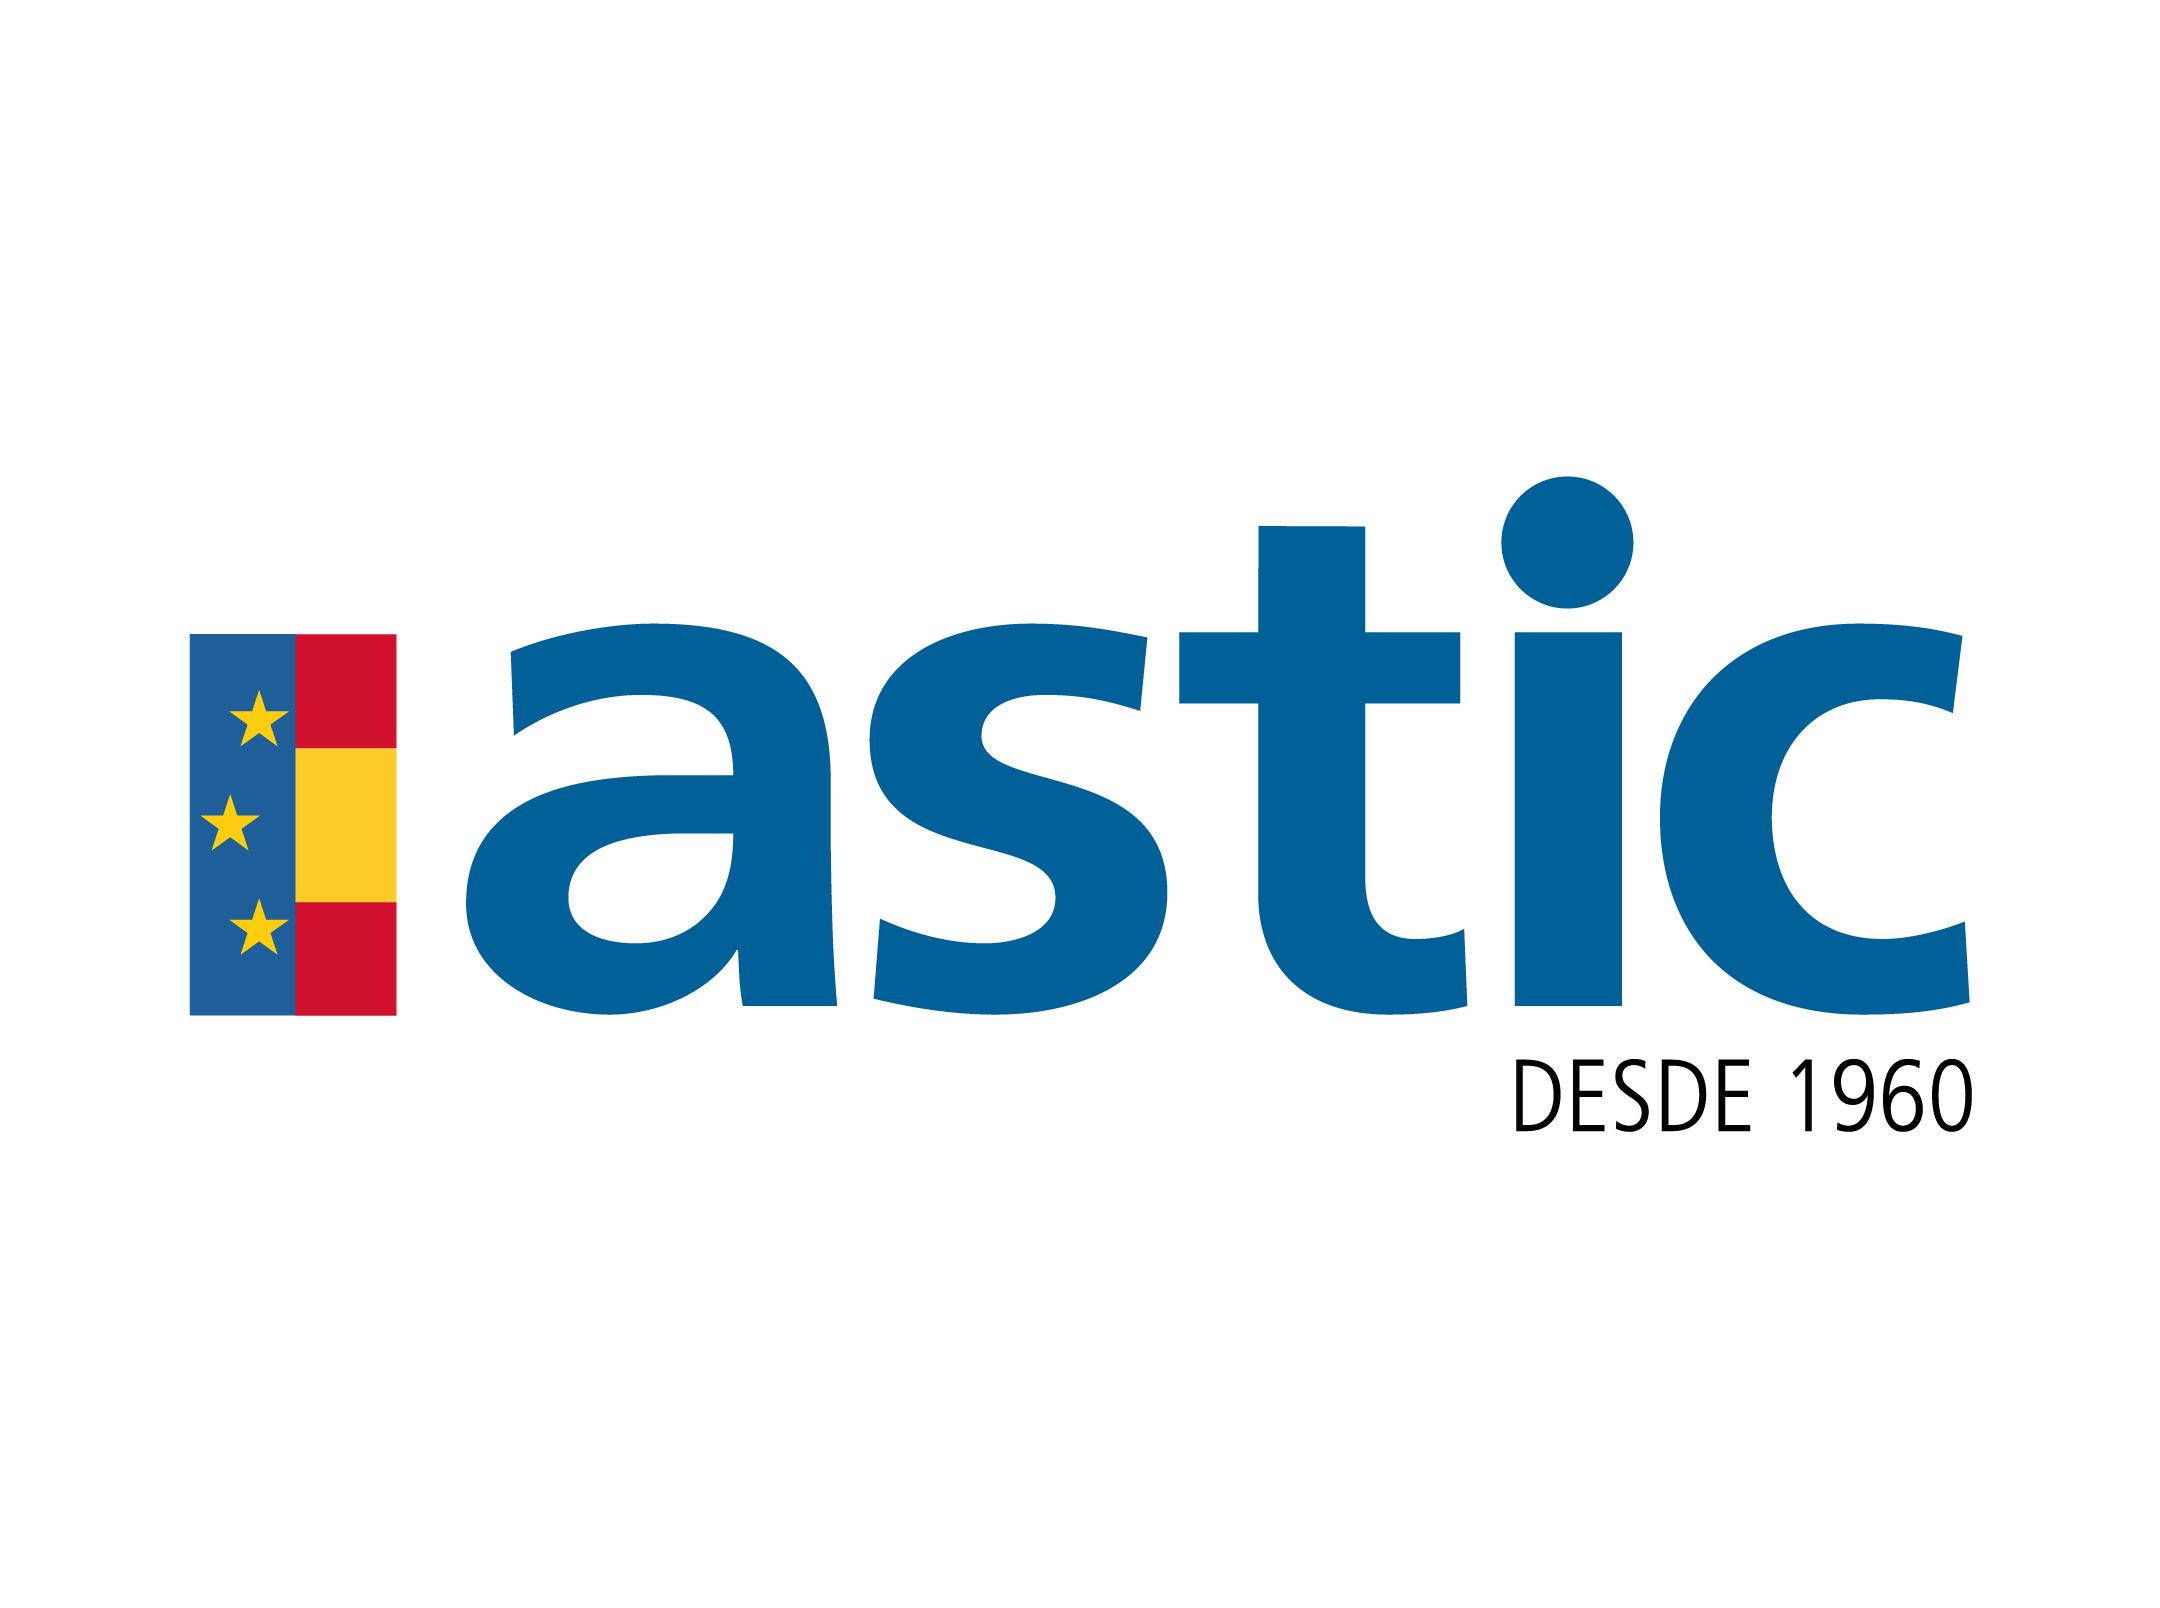 Logotipo astic